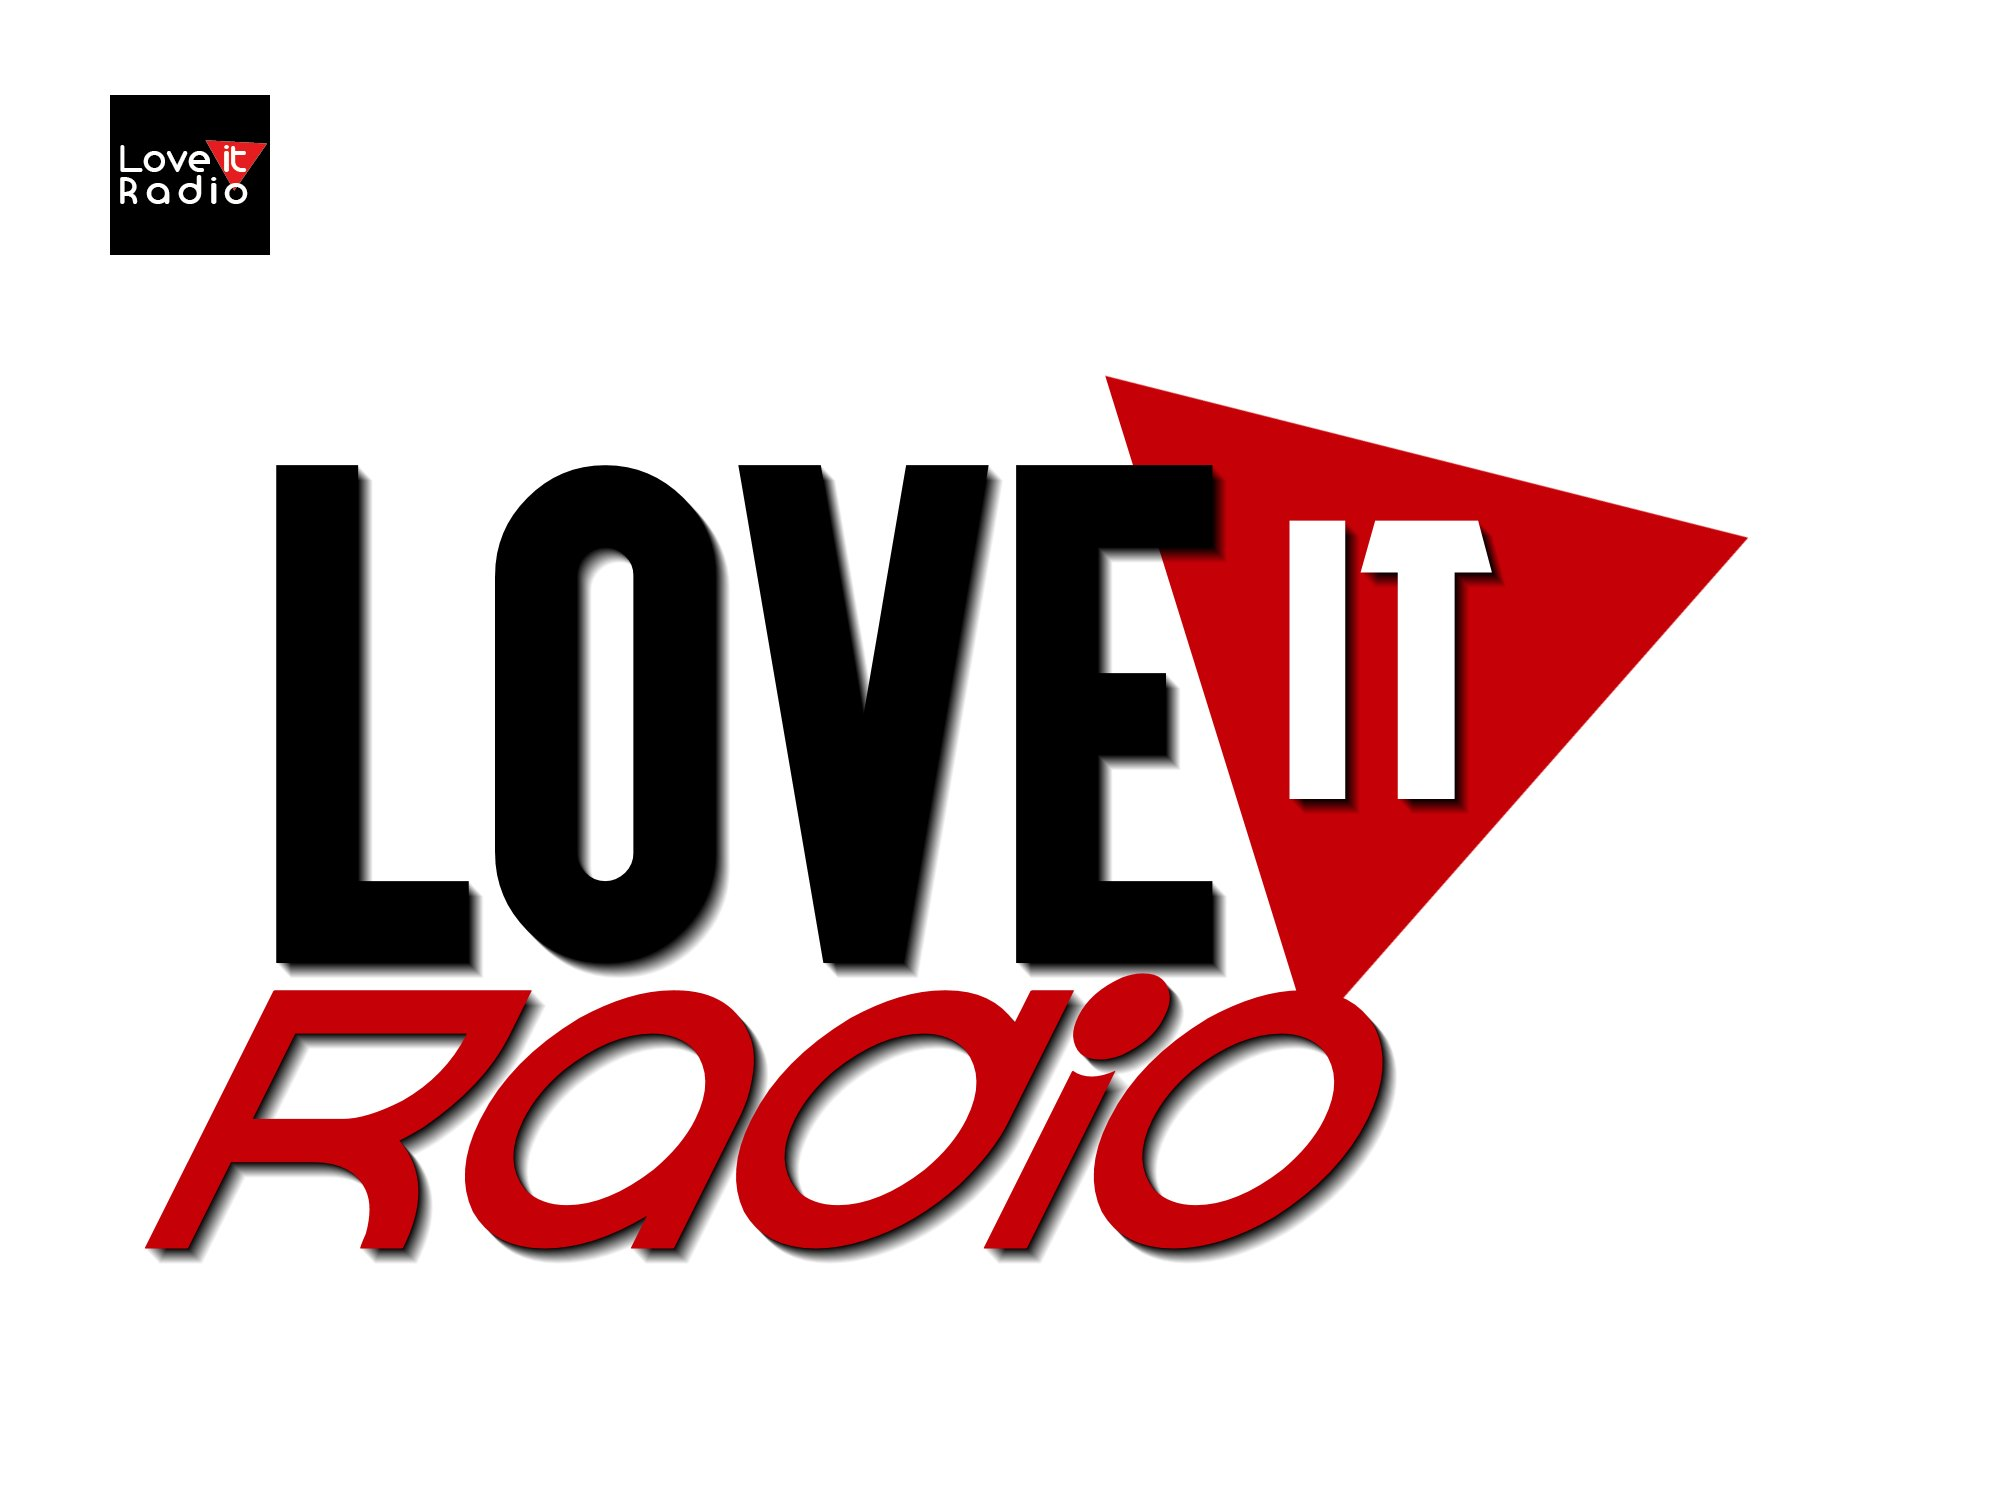 Loveitradio